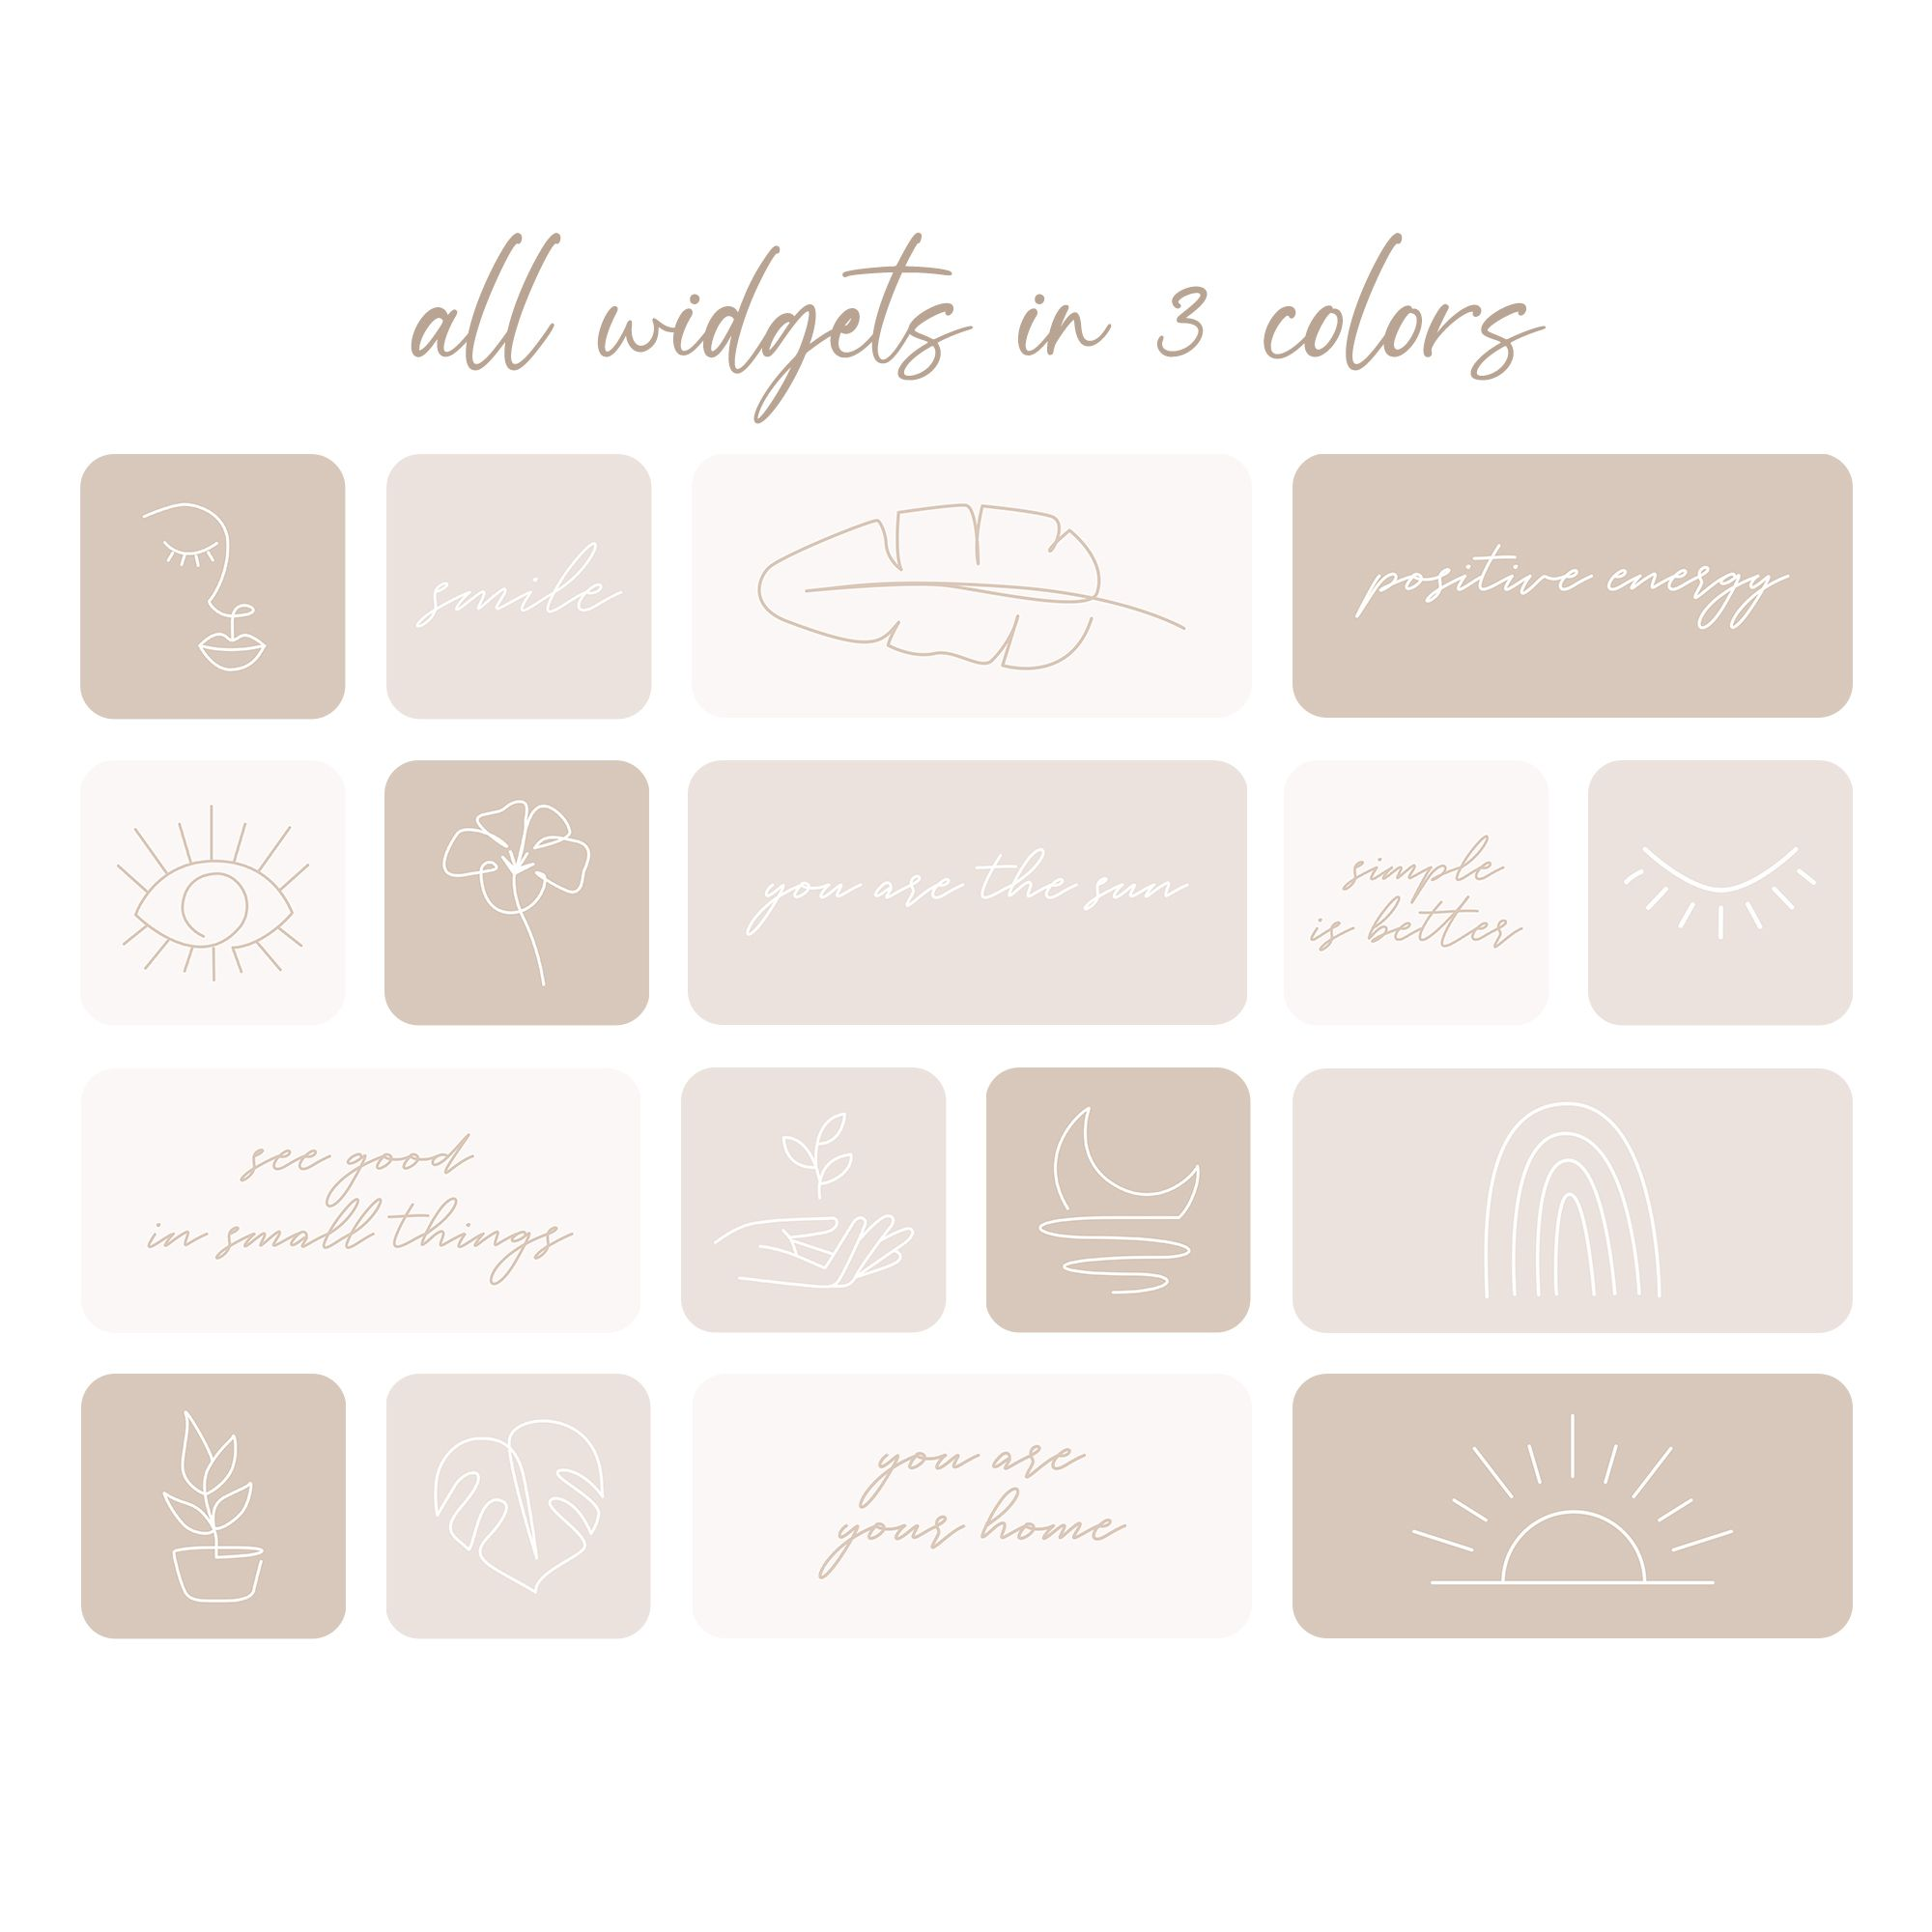 Walnut aesthetic ios 14 icons, beige boho ios 14 app icons iphone widget background neutral brown. Neutral Beige Aesthetic Boho iPhone iOS 14 App Icons ...